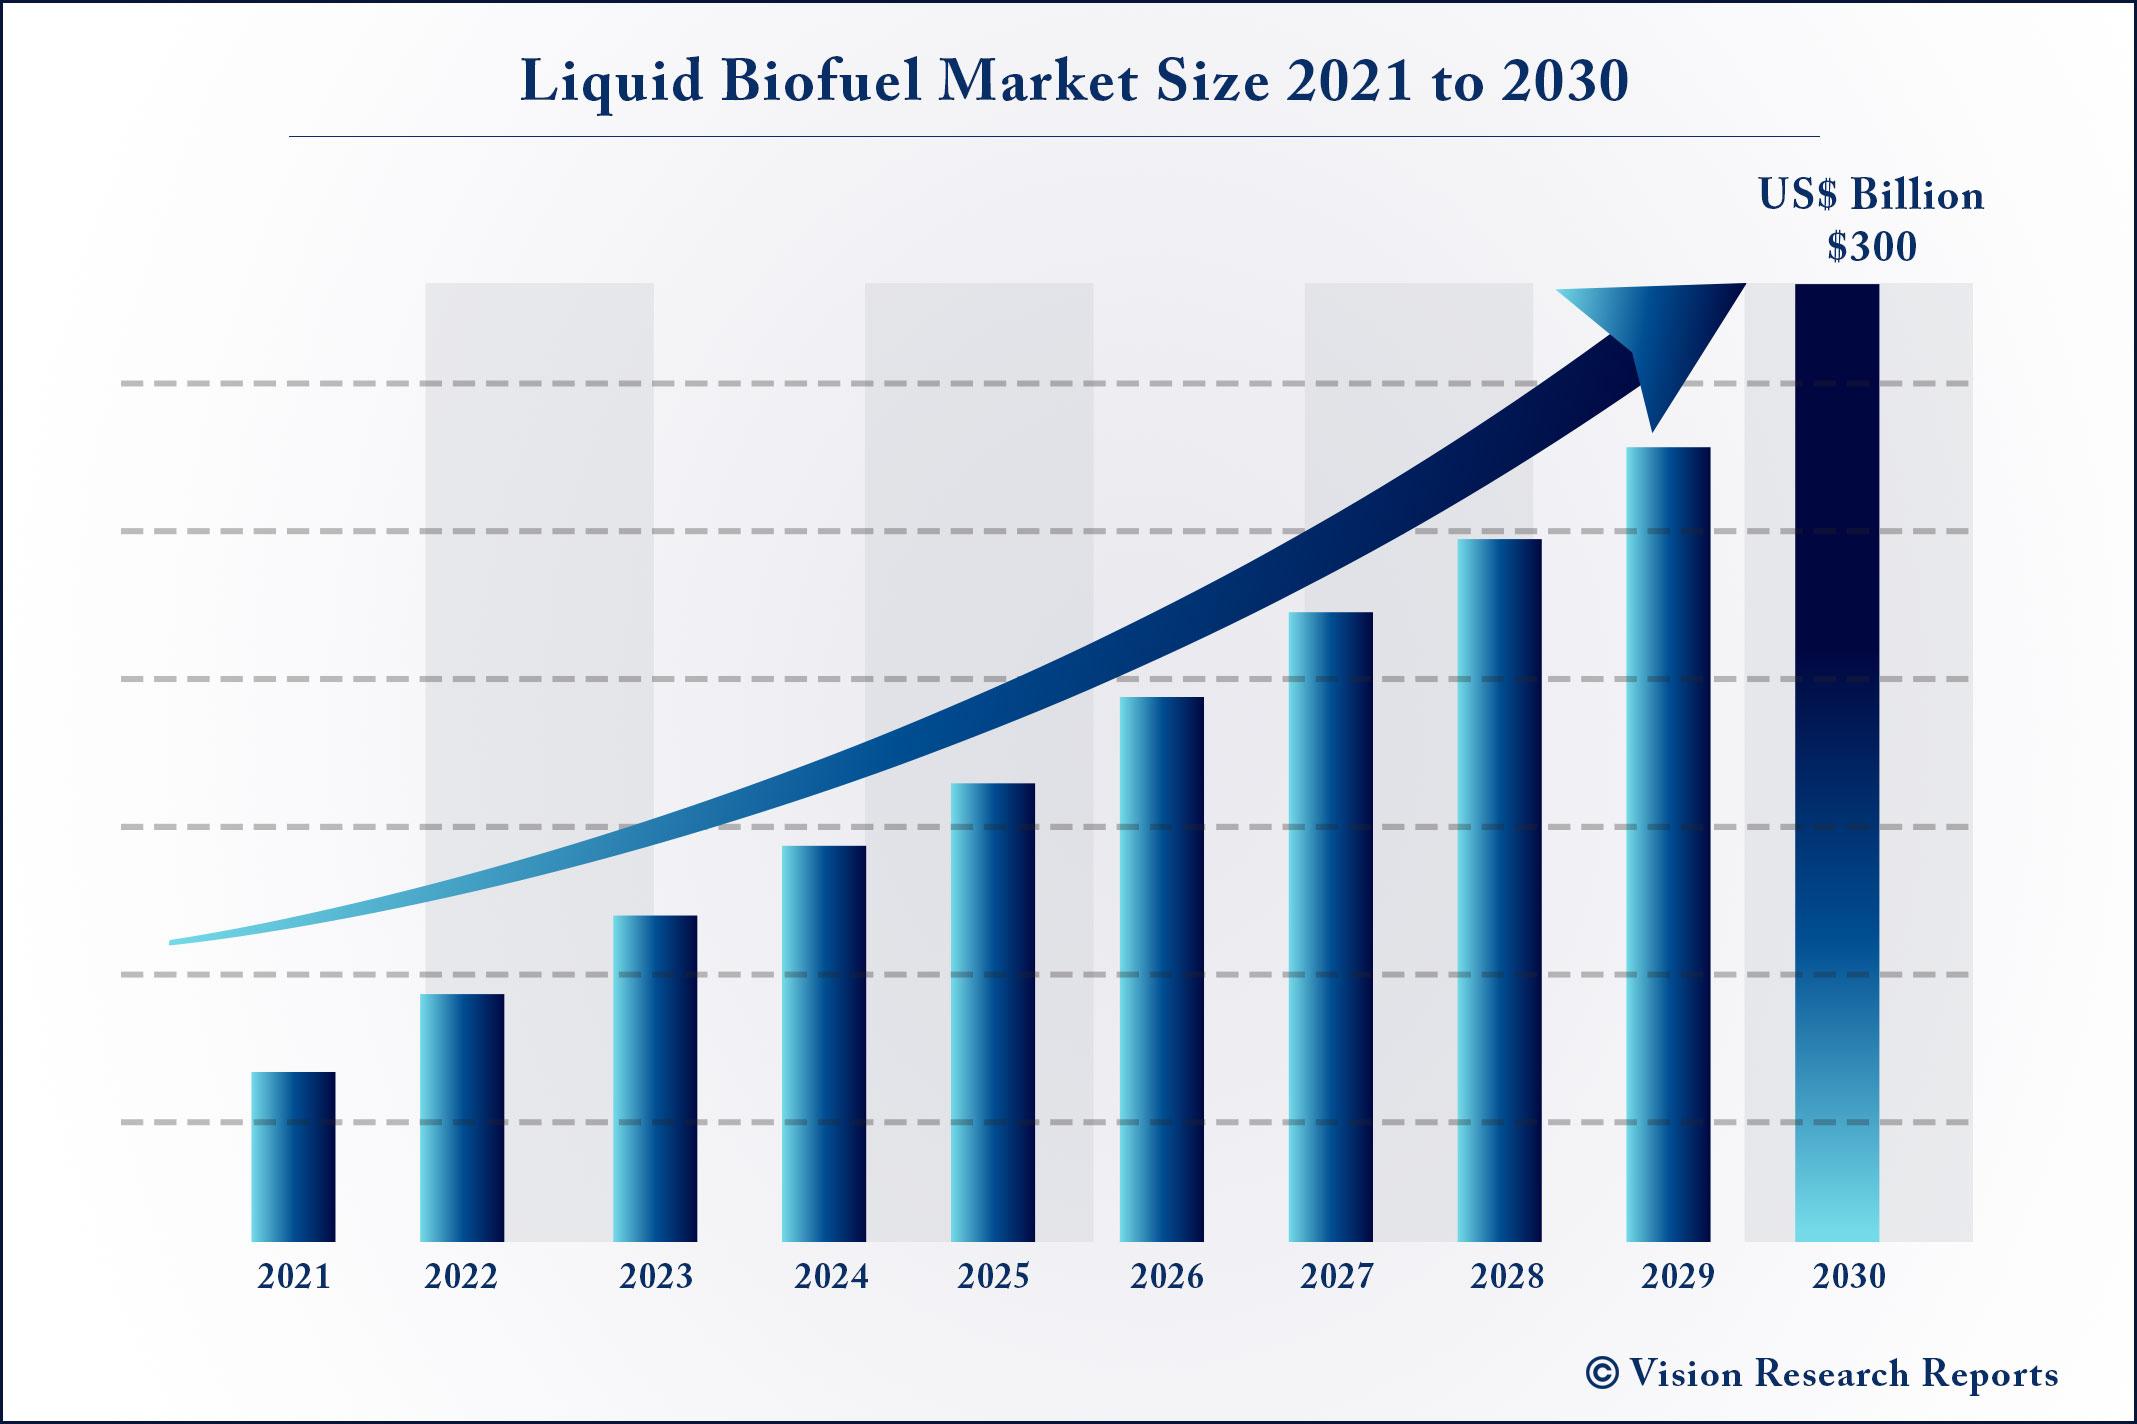 Liquid Biofuel Market Size 2021 to 2030